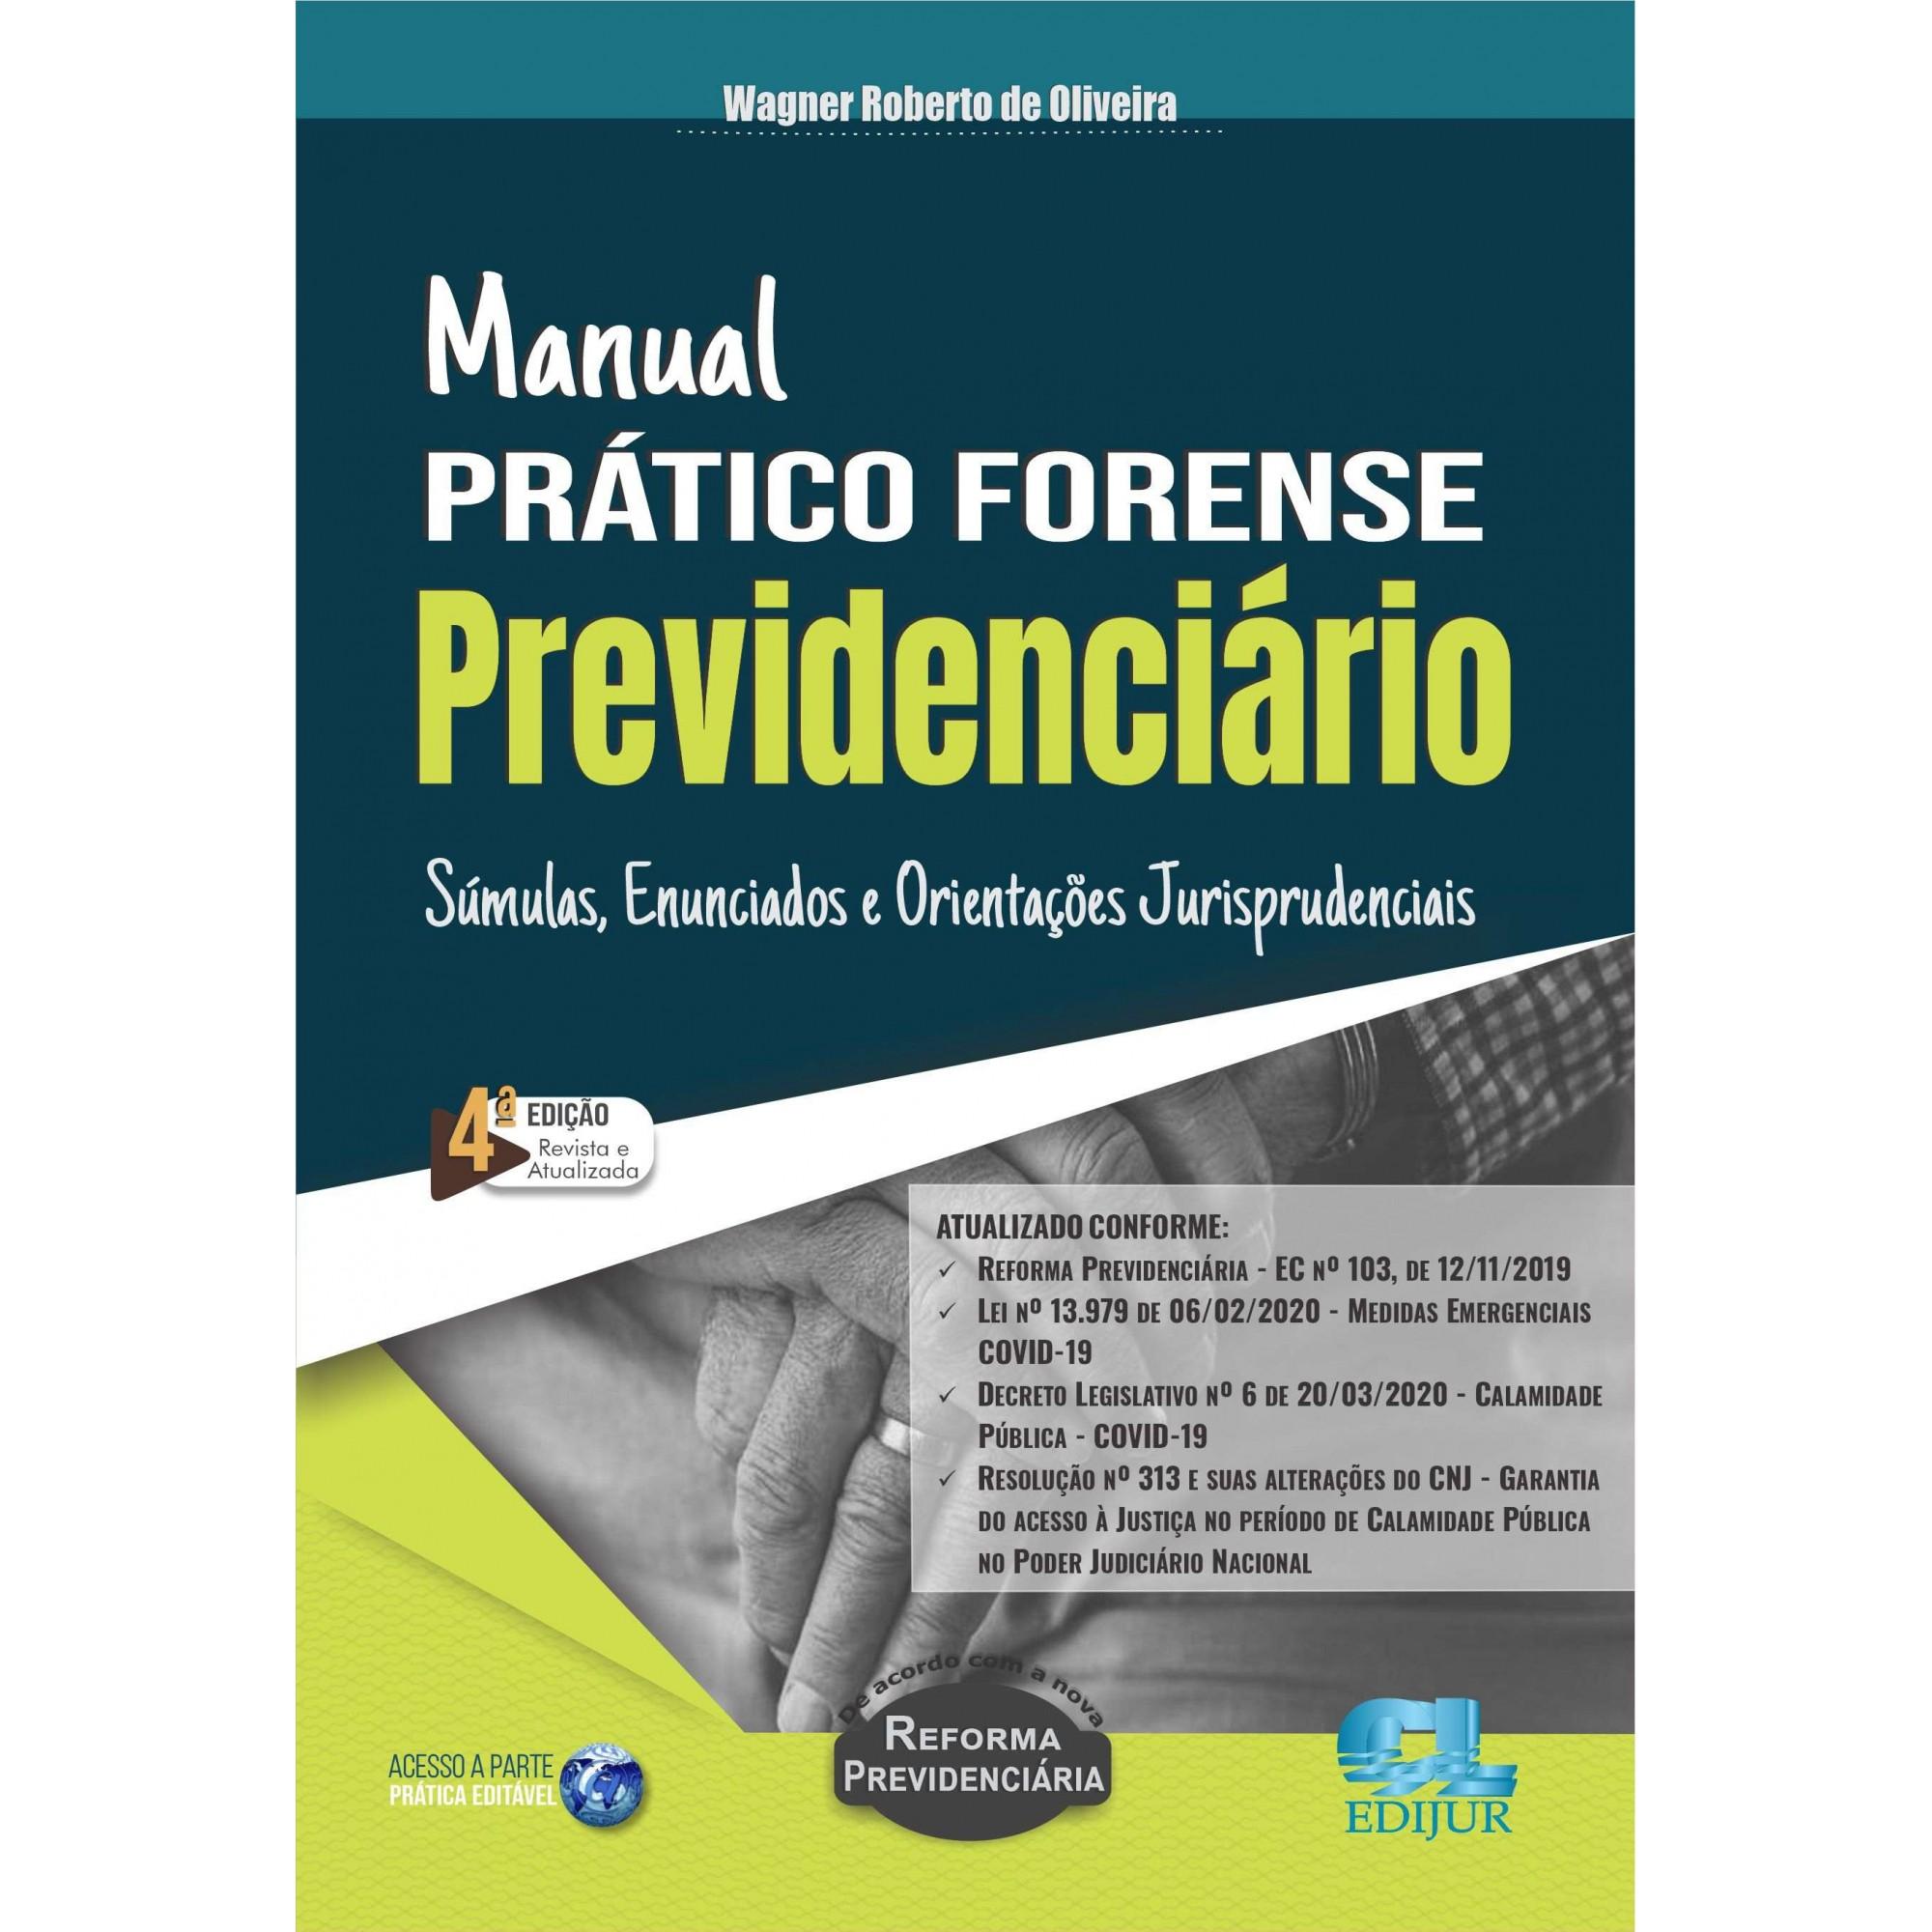 MANUAL PRÁTICO FORENSE PREVIDENCIÁRIO - 4ª EDIÇÃO  - Edijur Editora